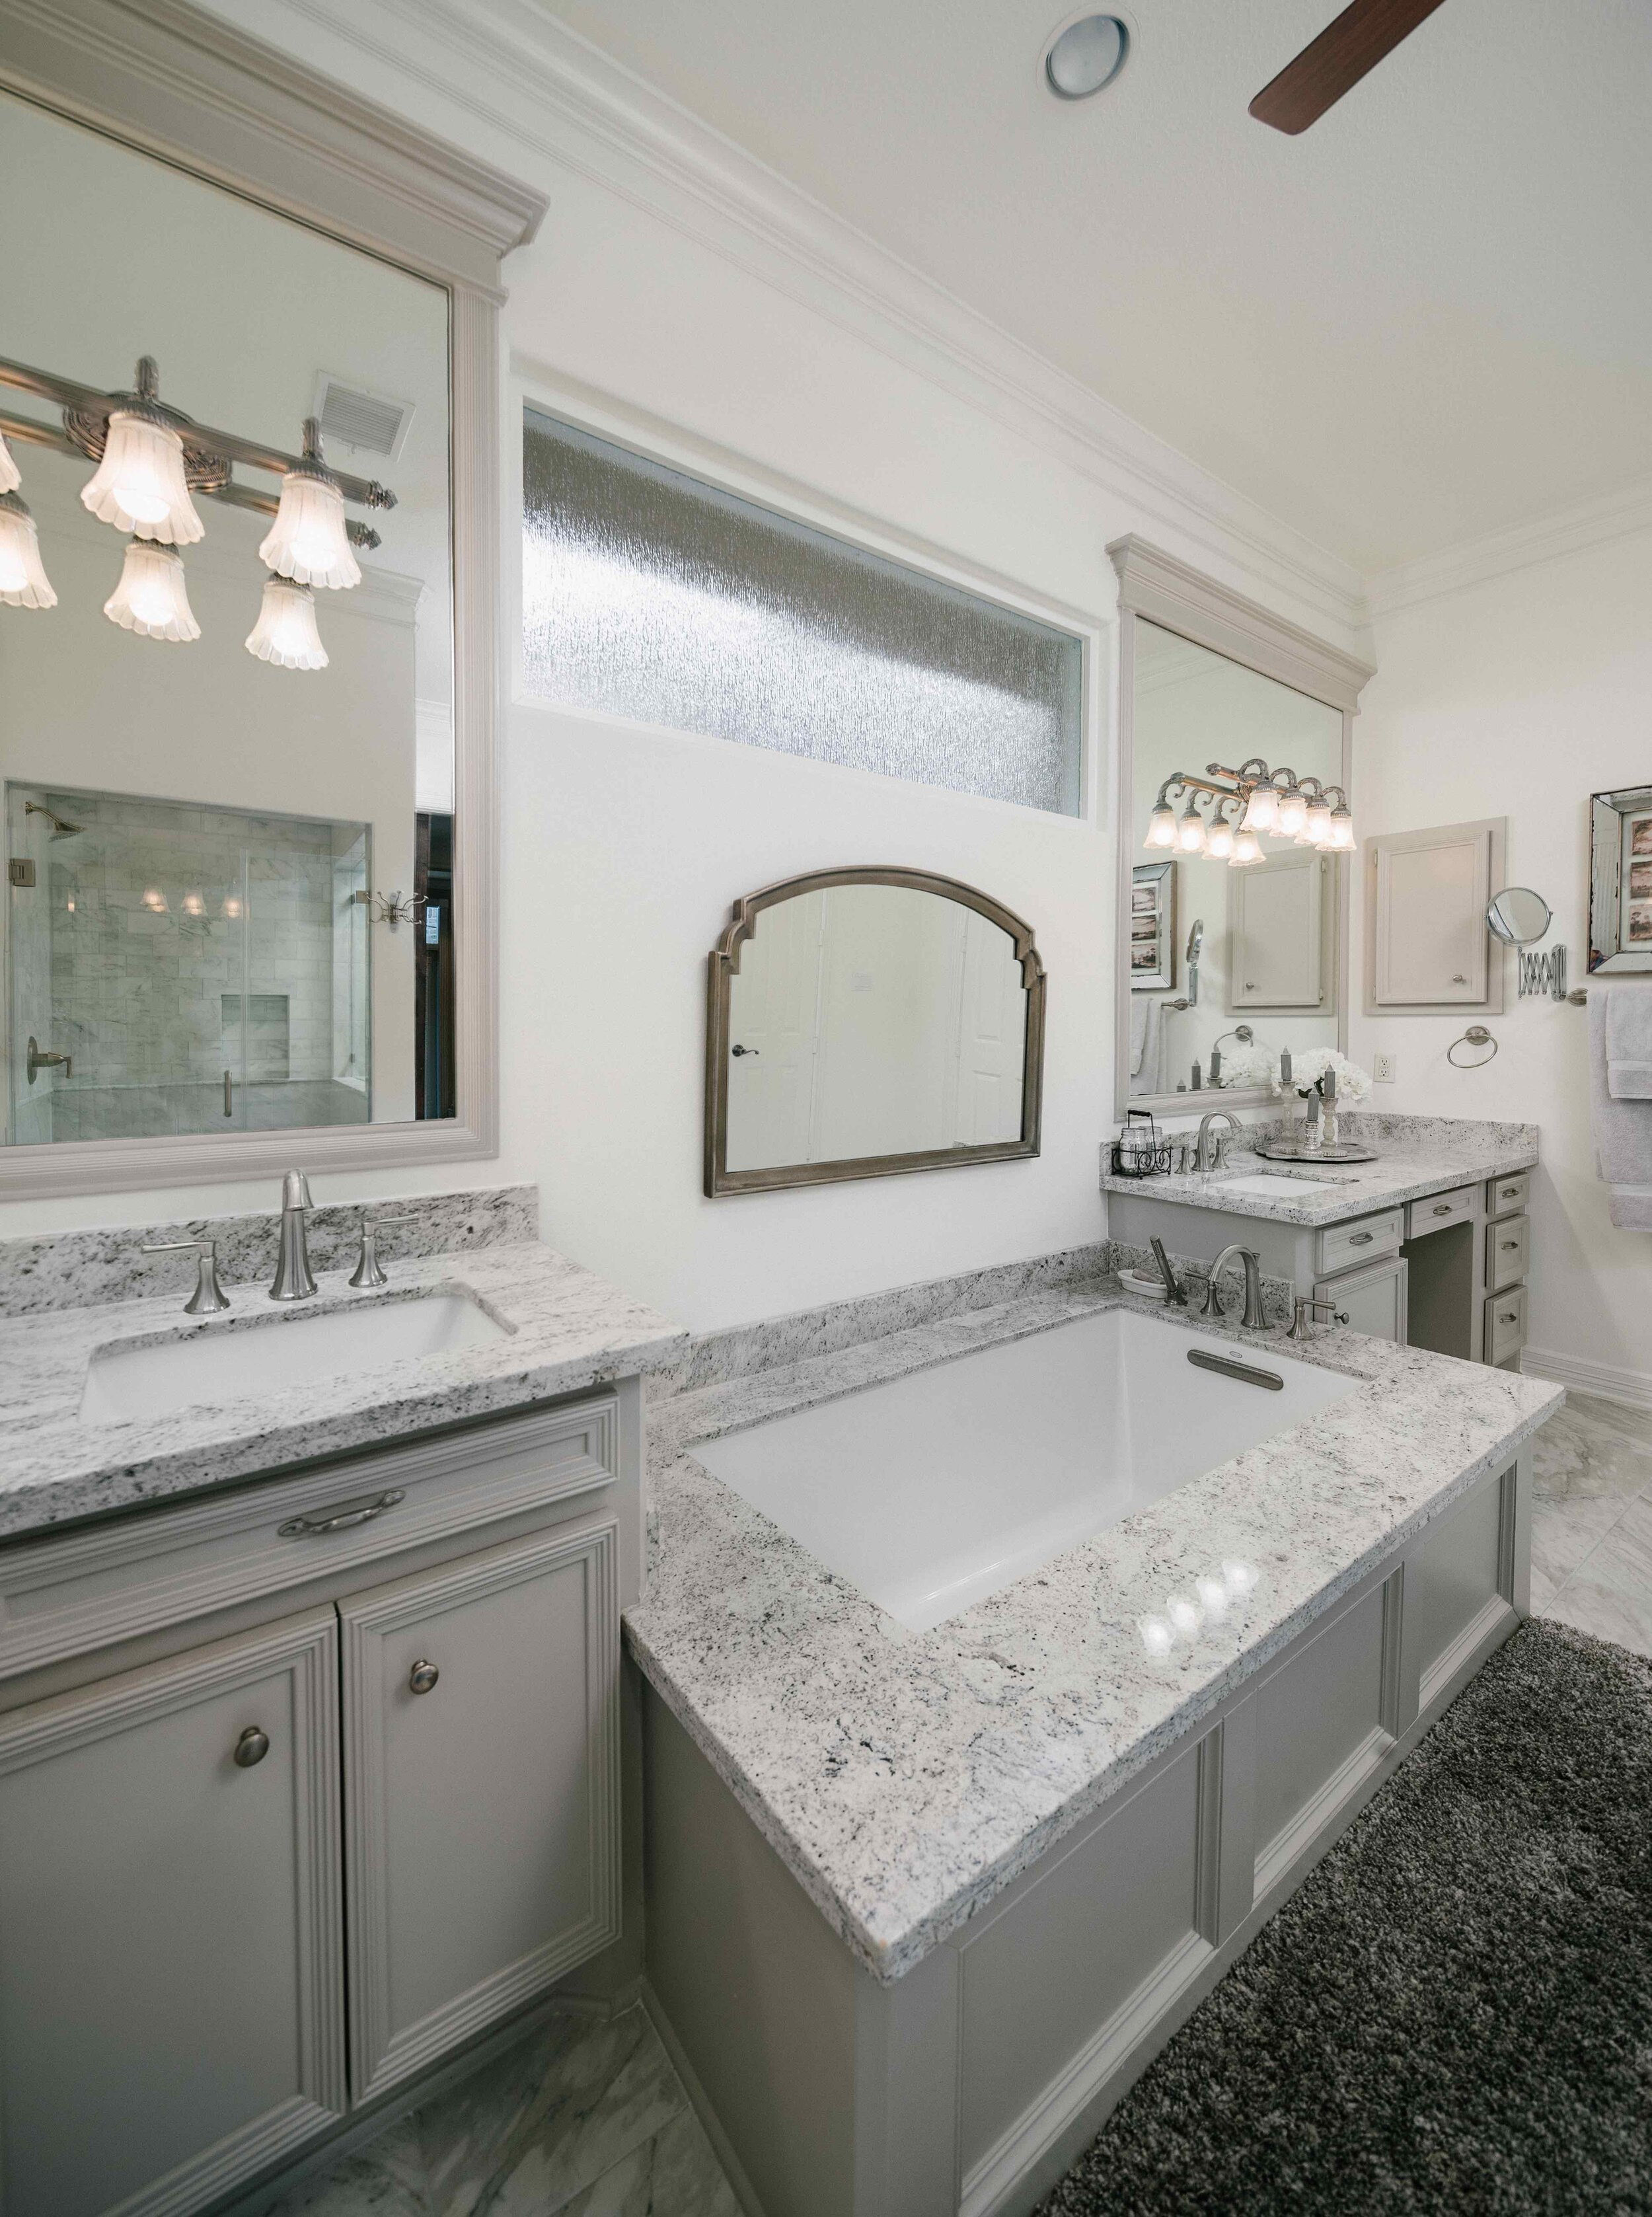 Master bathroom vanity, undermount bathtub, tub, undermount sink, soaking tub, frameless mirror, his and hers vanities, grey bathroom inspiration, grey bathroom, carrara marble tile, grey rug, grey paint, greige bathroom, greige paint, grey bathroom cabinets.